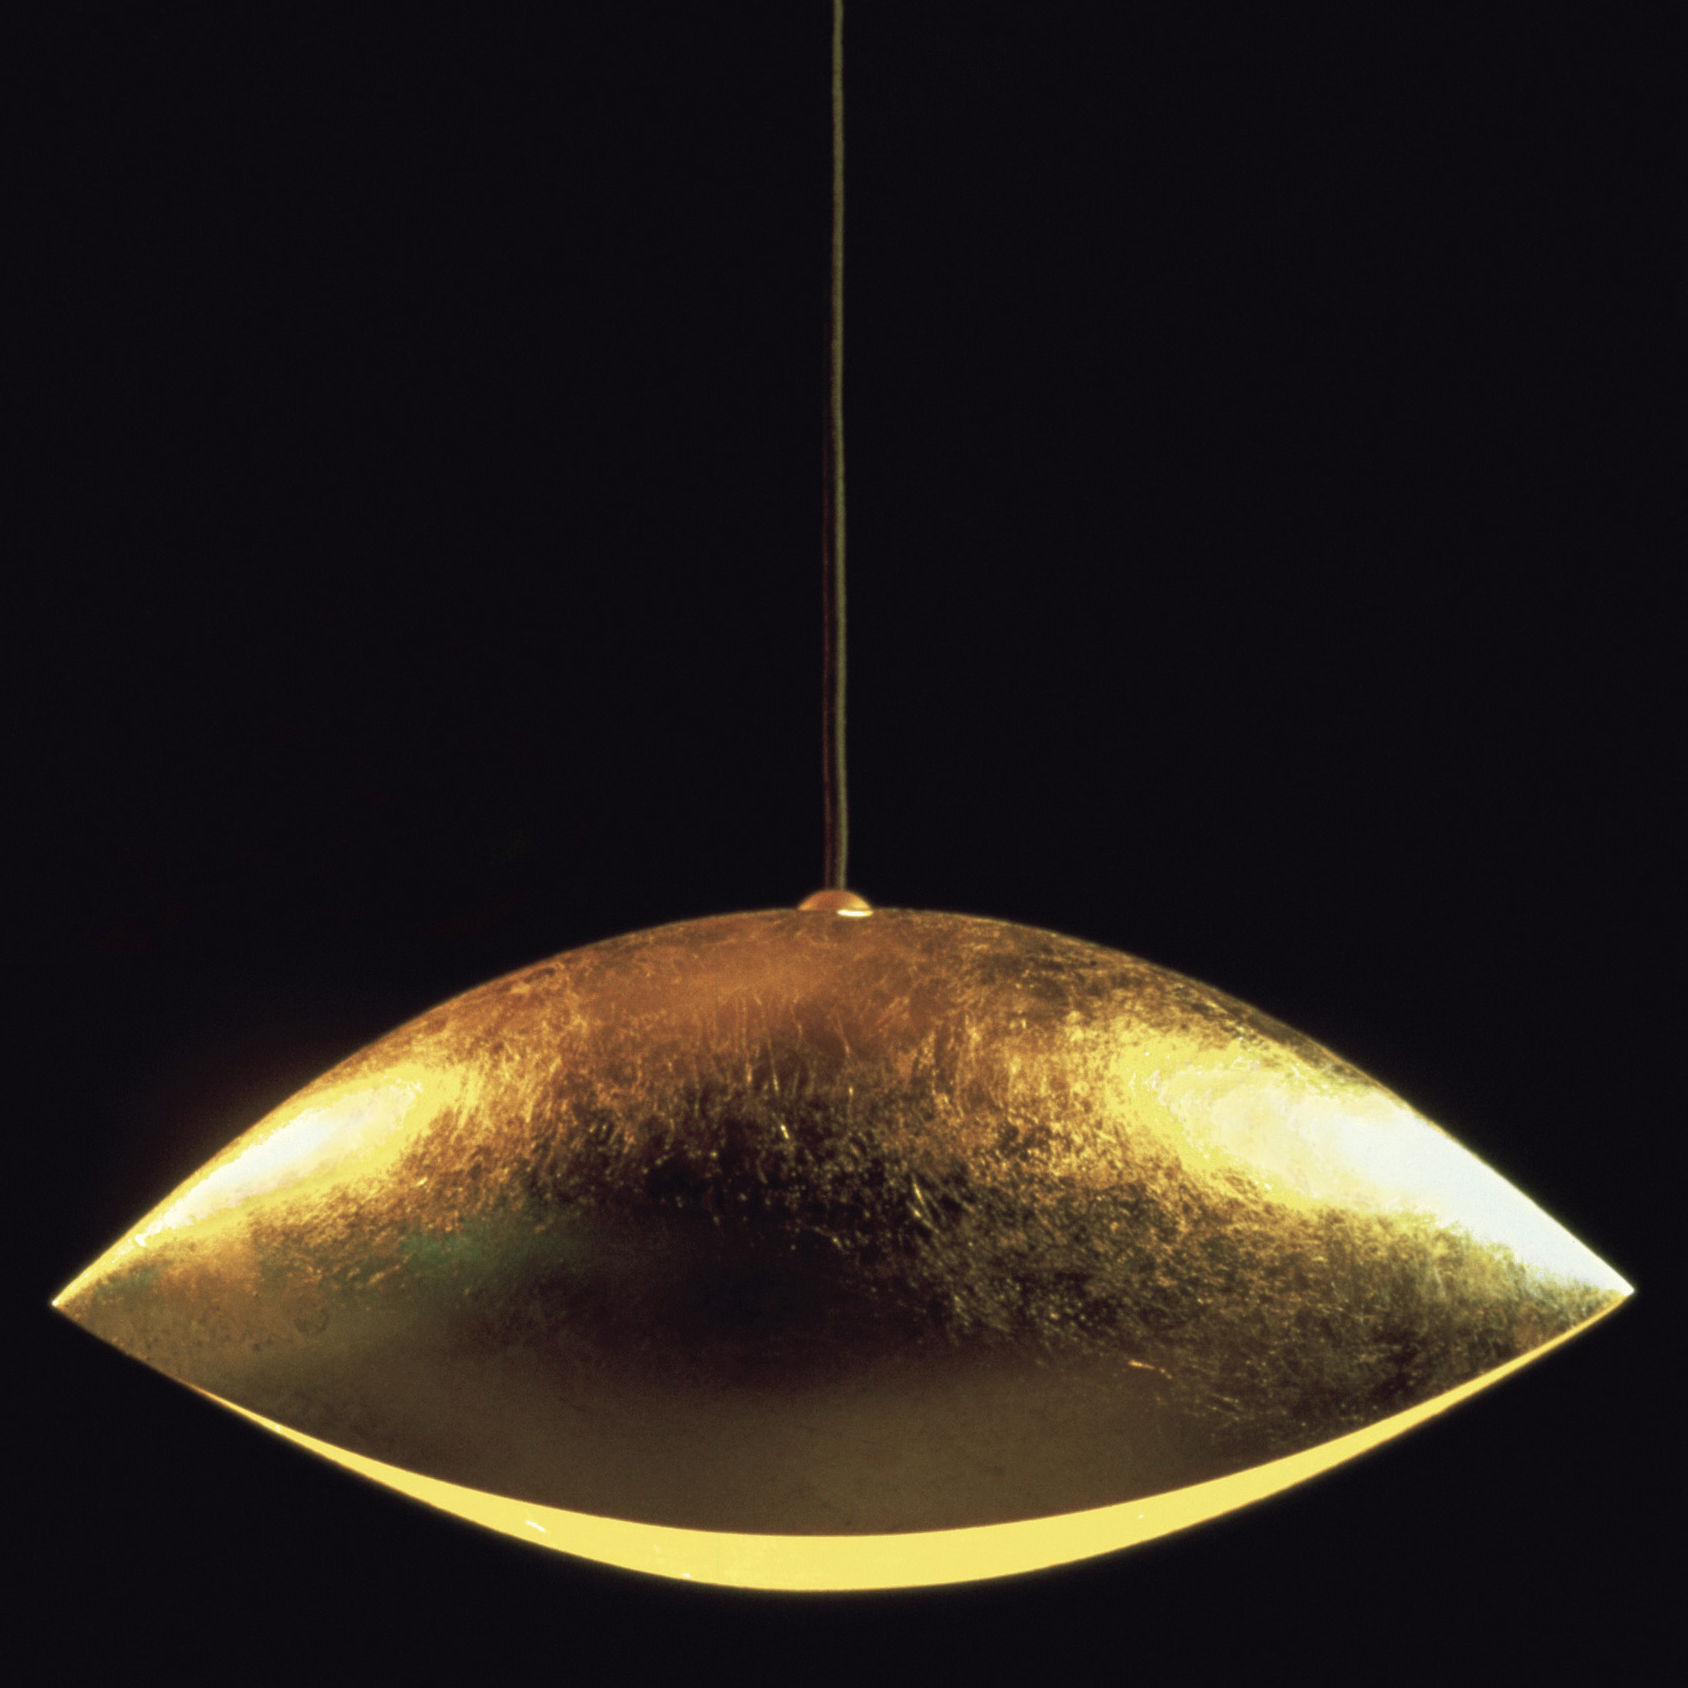 Leuchten - Pendelleuchten - Malagola Pendelleuchte / L 55 cm - Catellani & Smith - Goldfarben - Aluminium, Feuilles d'or